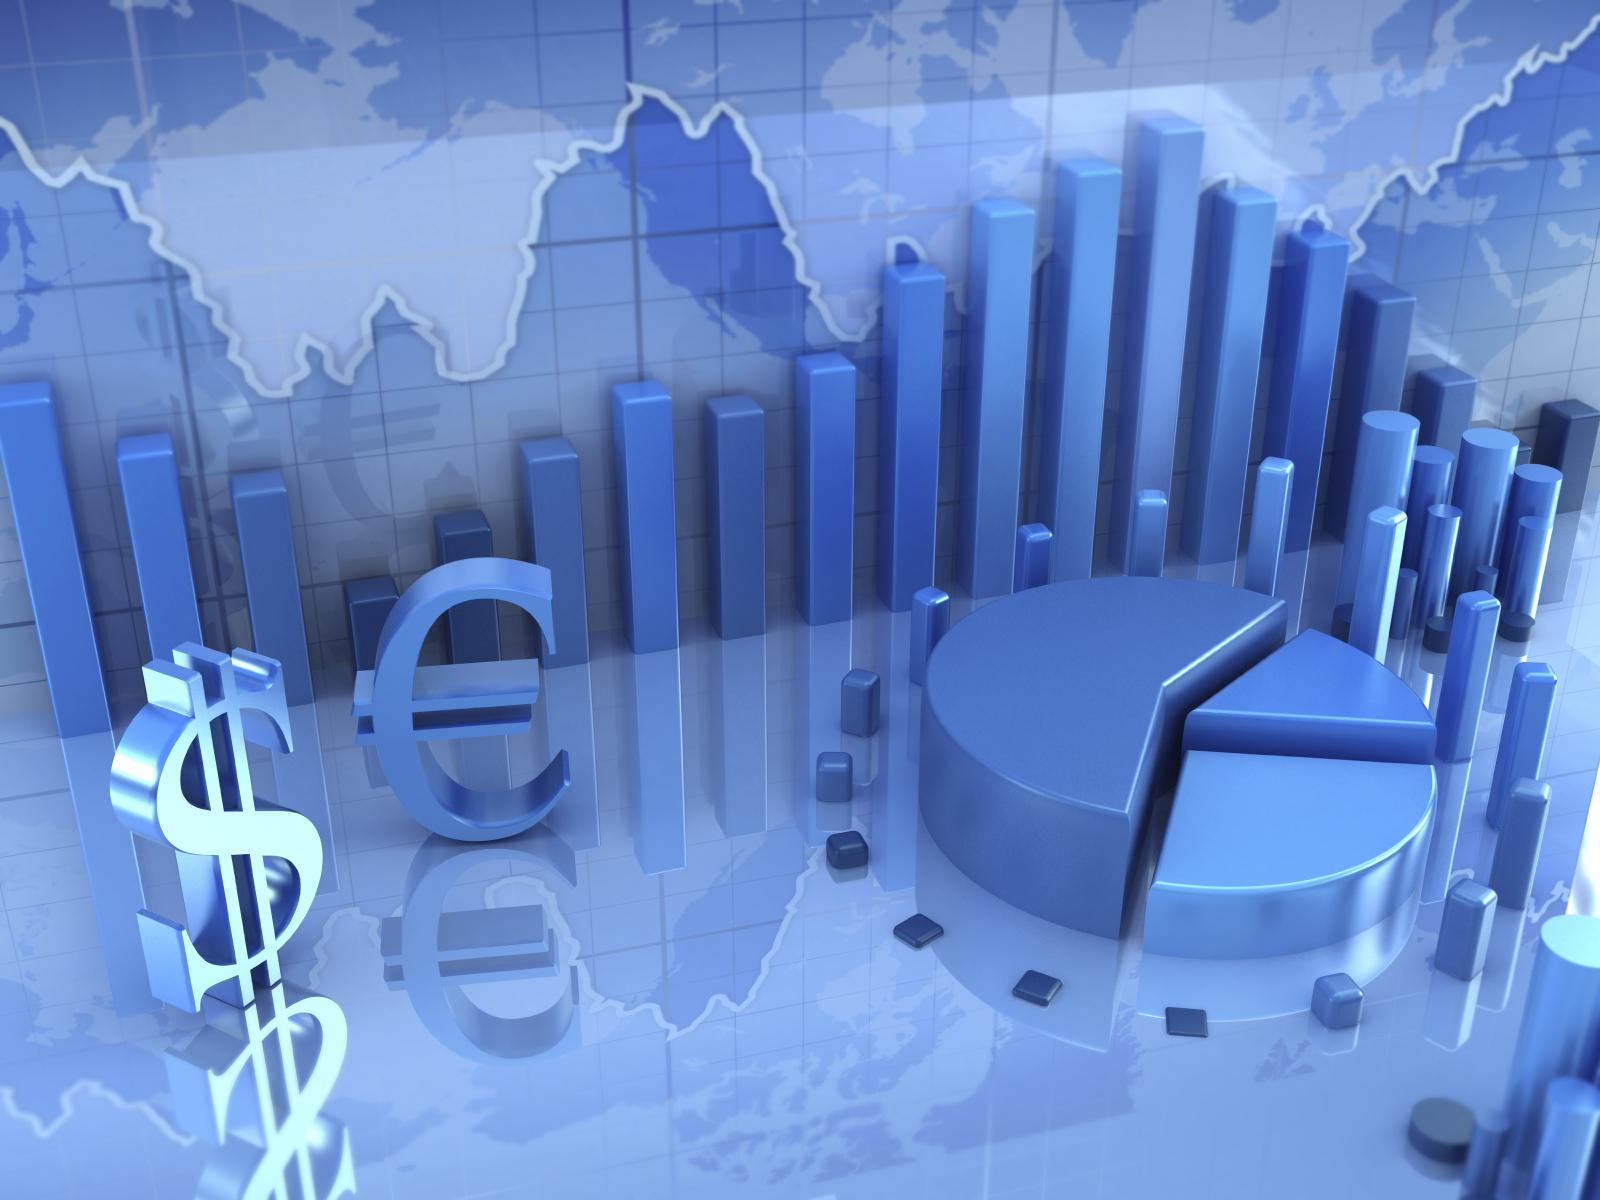 Migliori Broker trading online Regolamentati 2021. Tradingmania.it